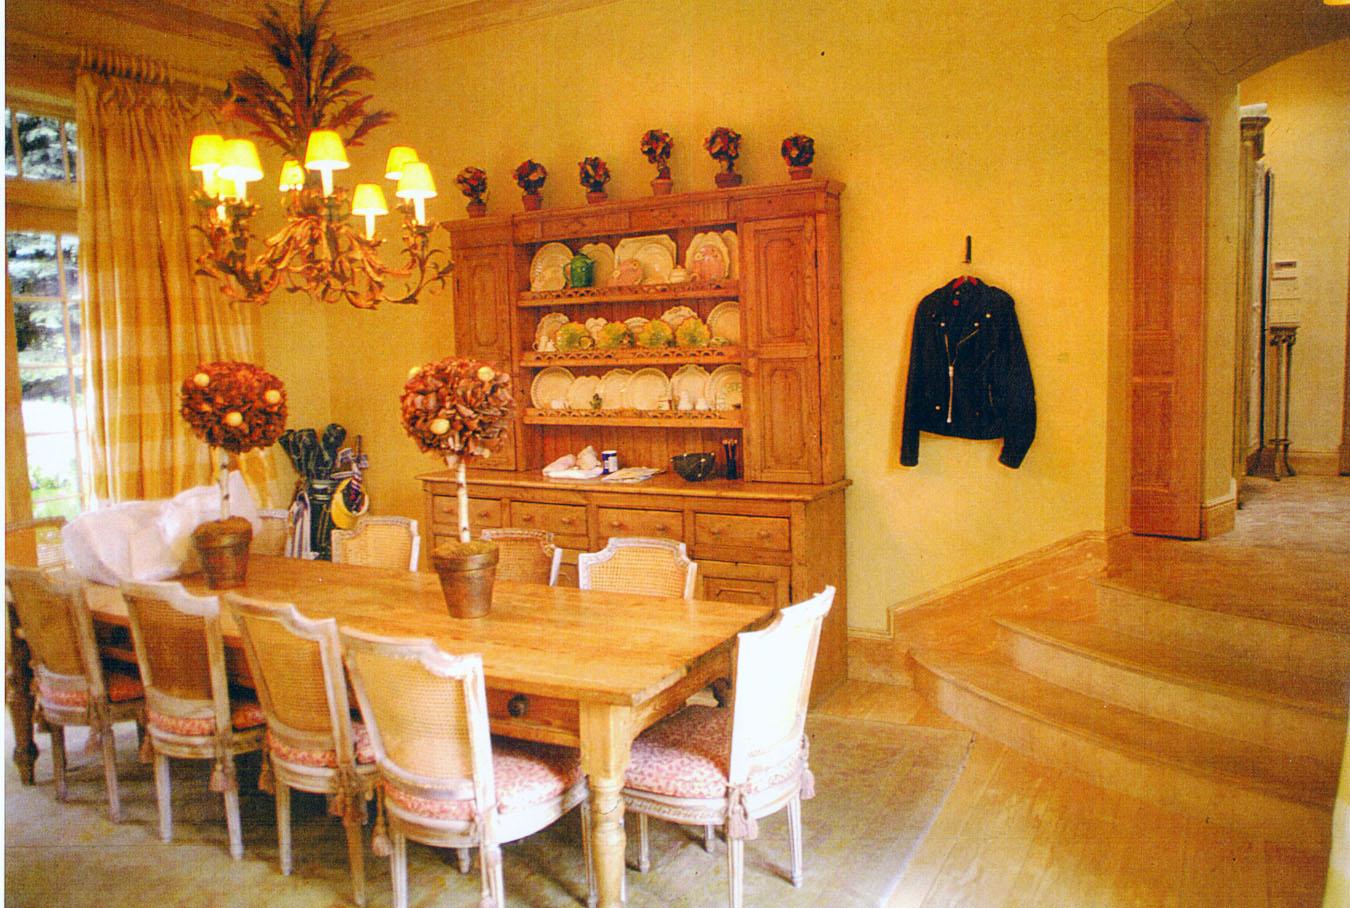 Vail.Colorado.Forbes.Ski_House.Robert_Orr_&_Associates.Architecture.Landscape_Architecture.Urbanism.Dining_Room.jpg